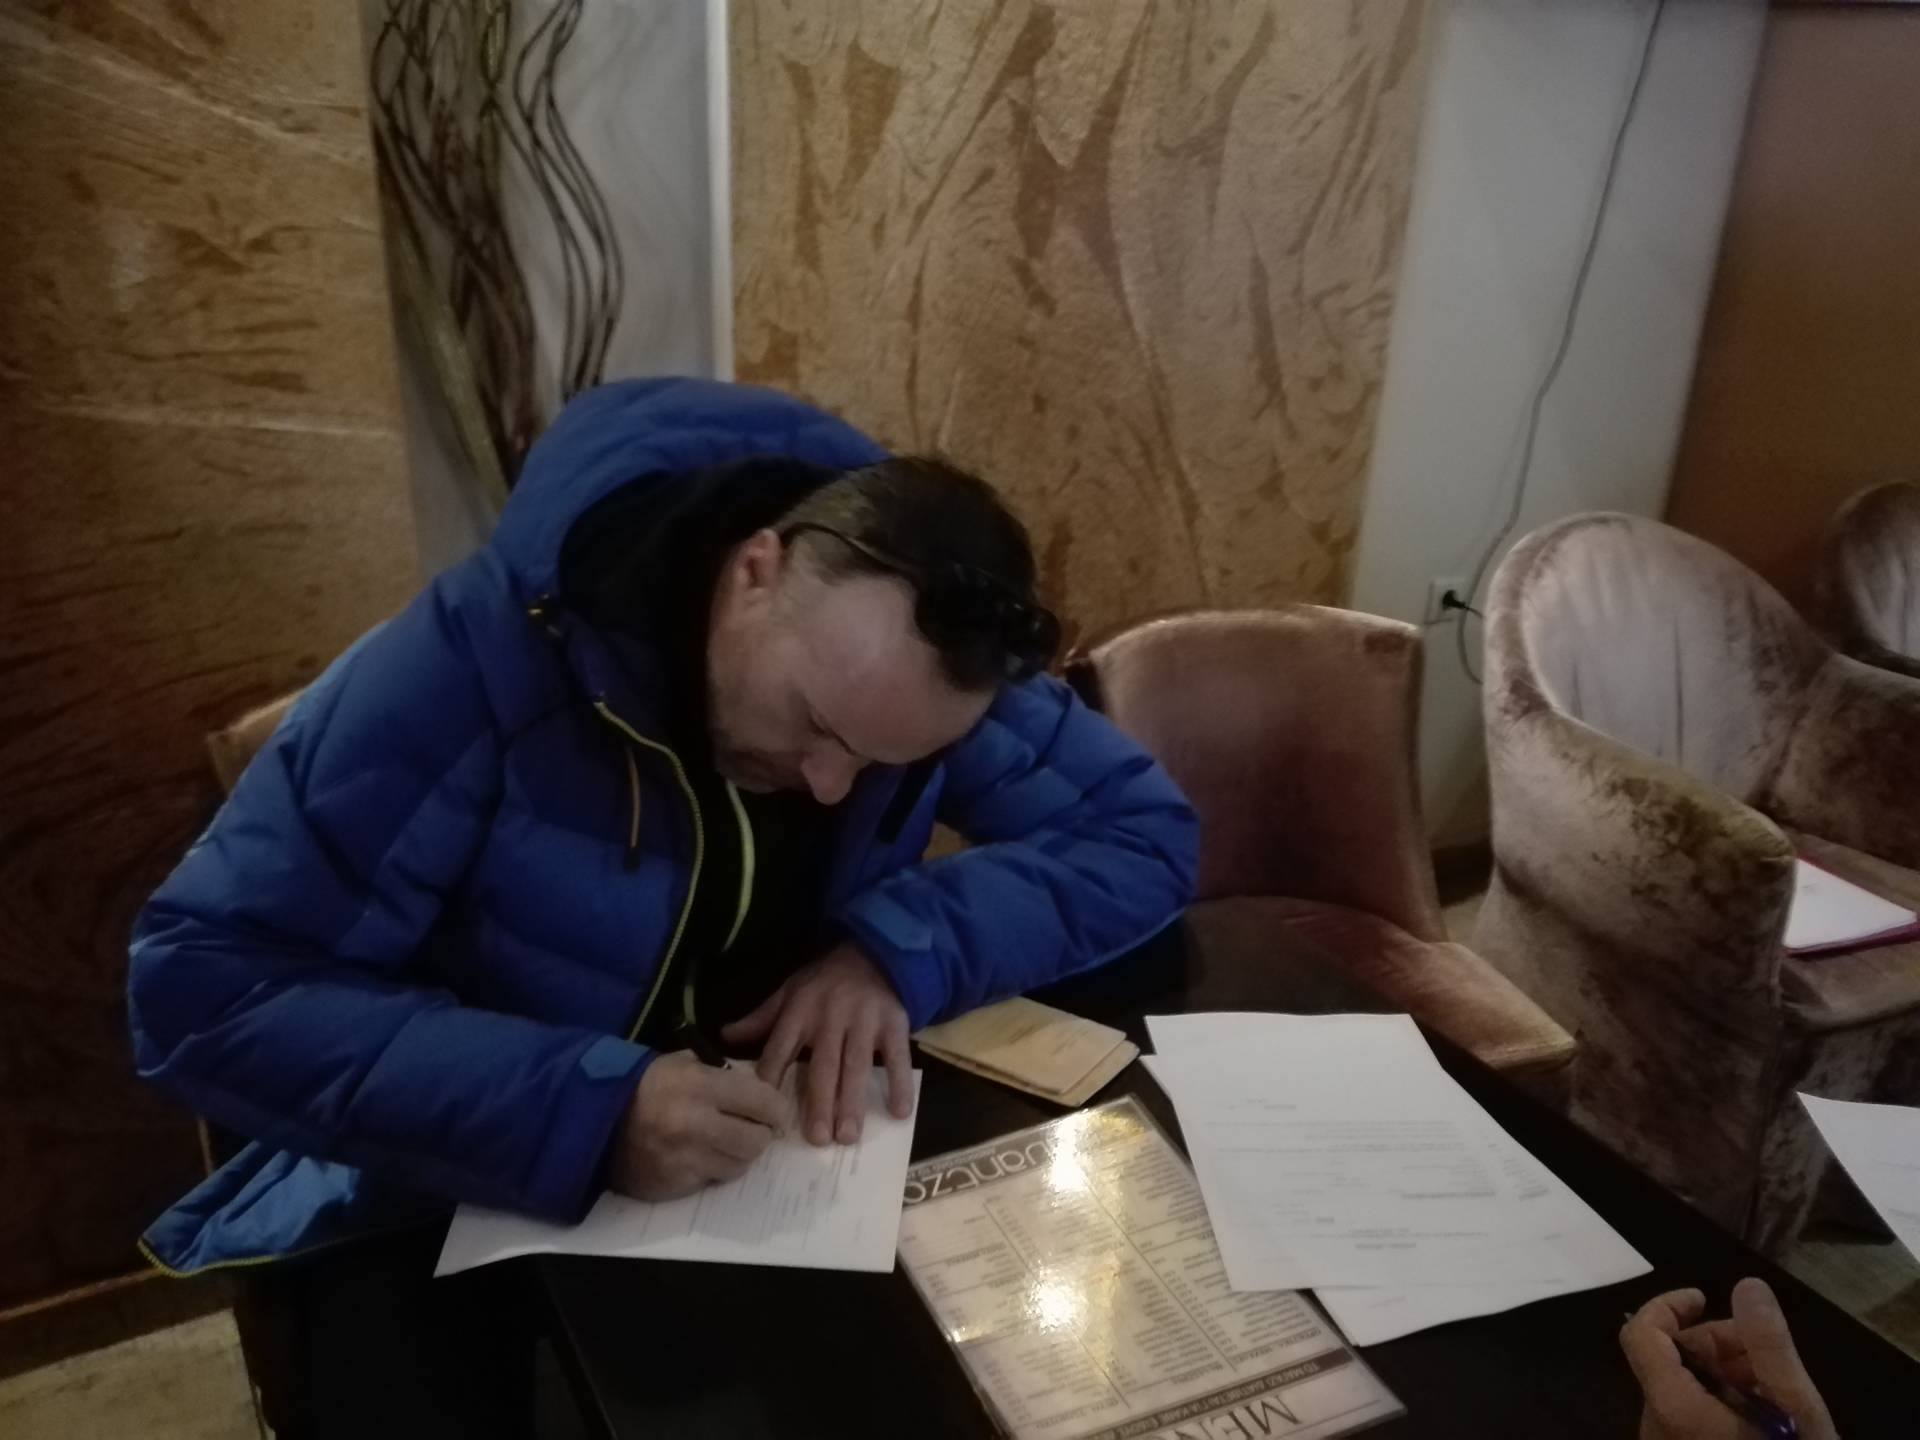 kozan.gr: Ο Μελισσοκομικός Σύλλογος Π.Ε. Κοζάνης ενημέρωσε τα μέλη του για την υποχρεωτική συμπλήρωση υπεύθυνων δηλώσεων αριθμού κυψελών (Βίντεο & Φωτογραφίες)